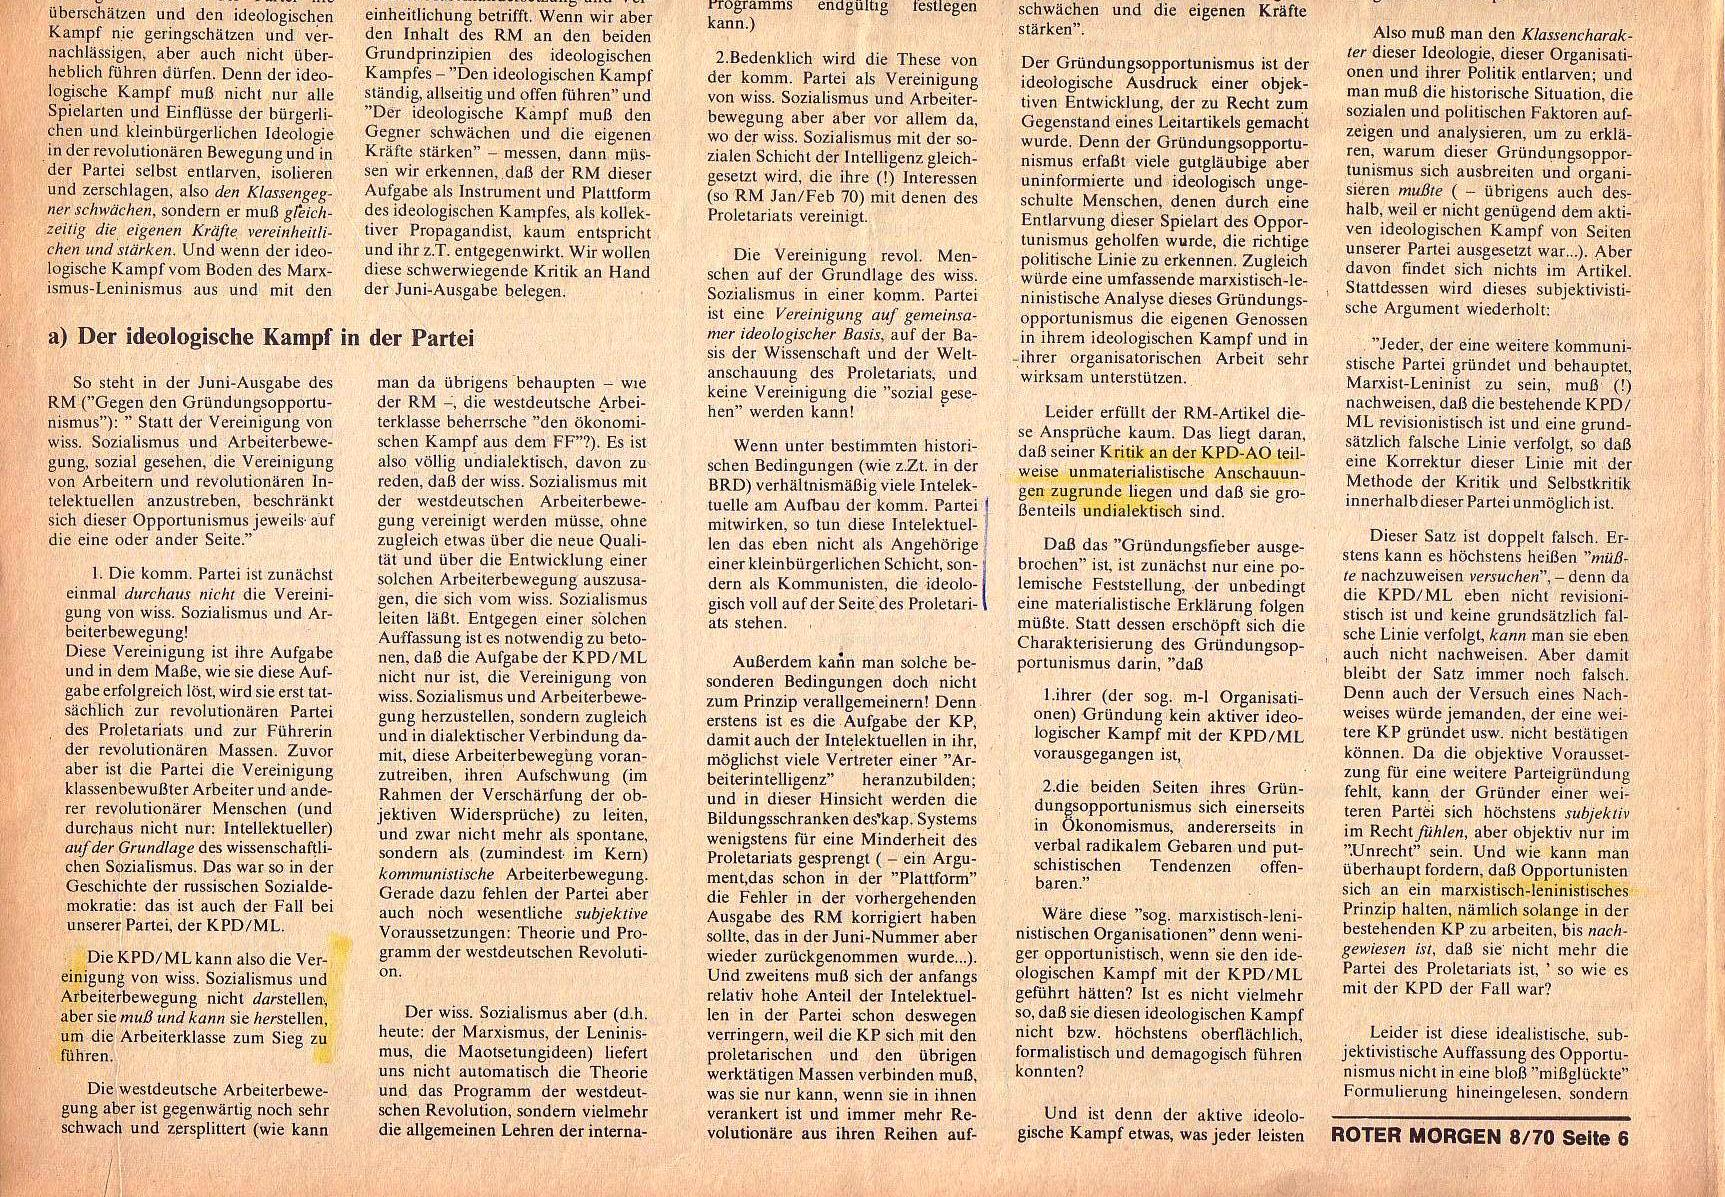 Roter Morgen, 4. Jg., September 1970, Nr. 8, Seite 6b